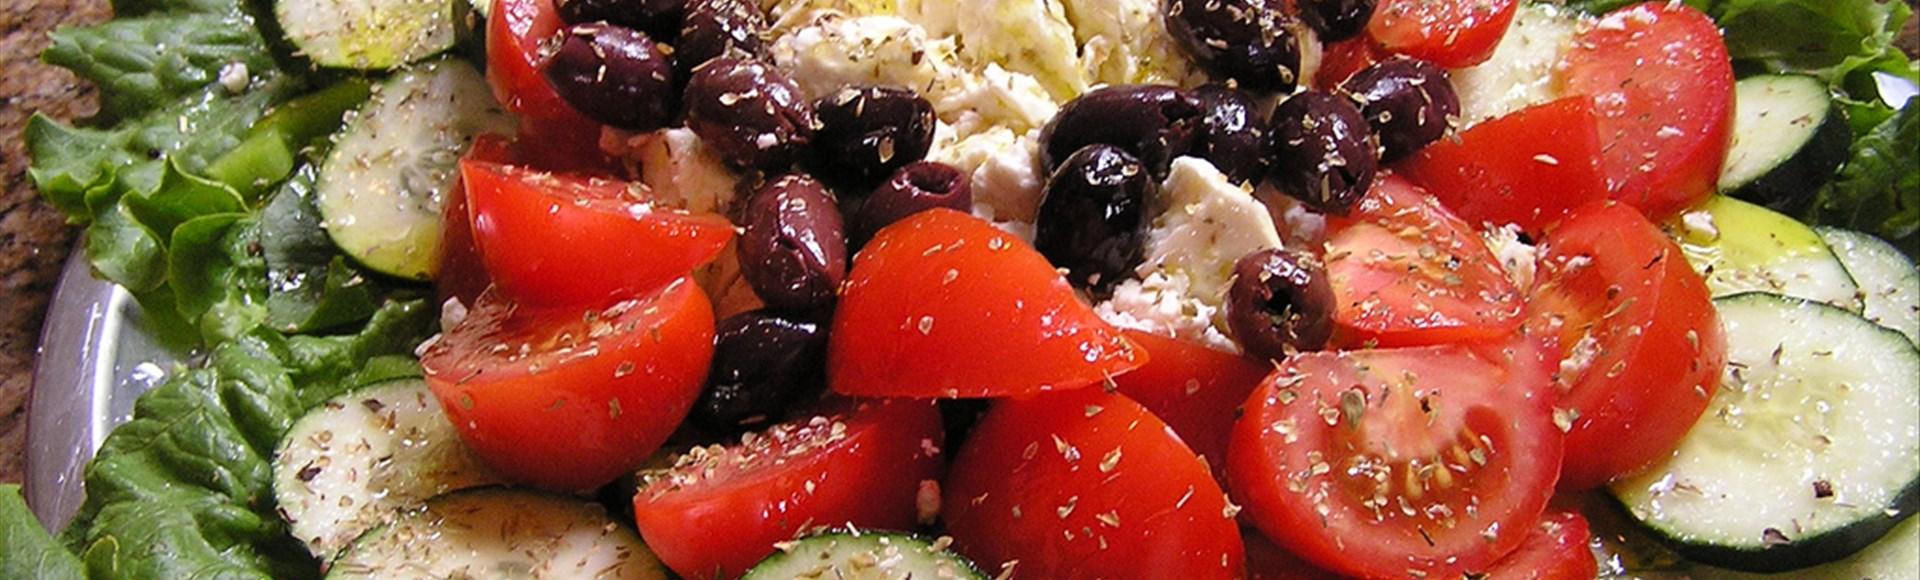 chef-antonis-heraklion-crete-greece-2 - Chef Antonis - Heraklion, Crete, Greece - Villas with Pools in Crete, Corfu & Paros   Handpicked by Alargo